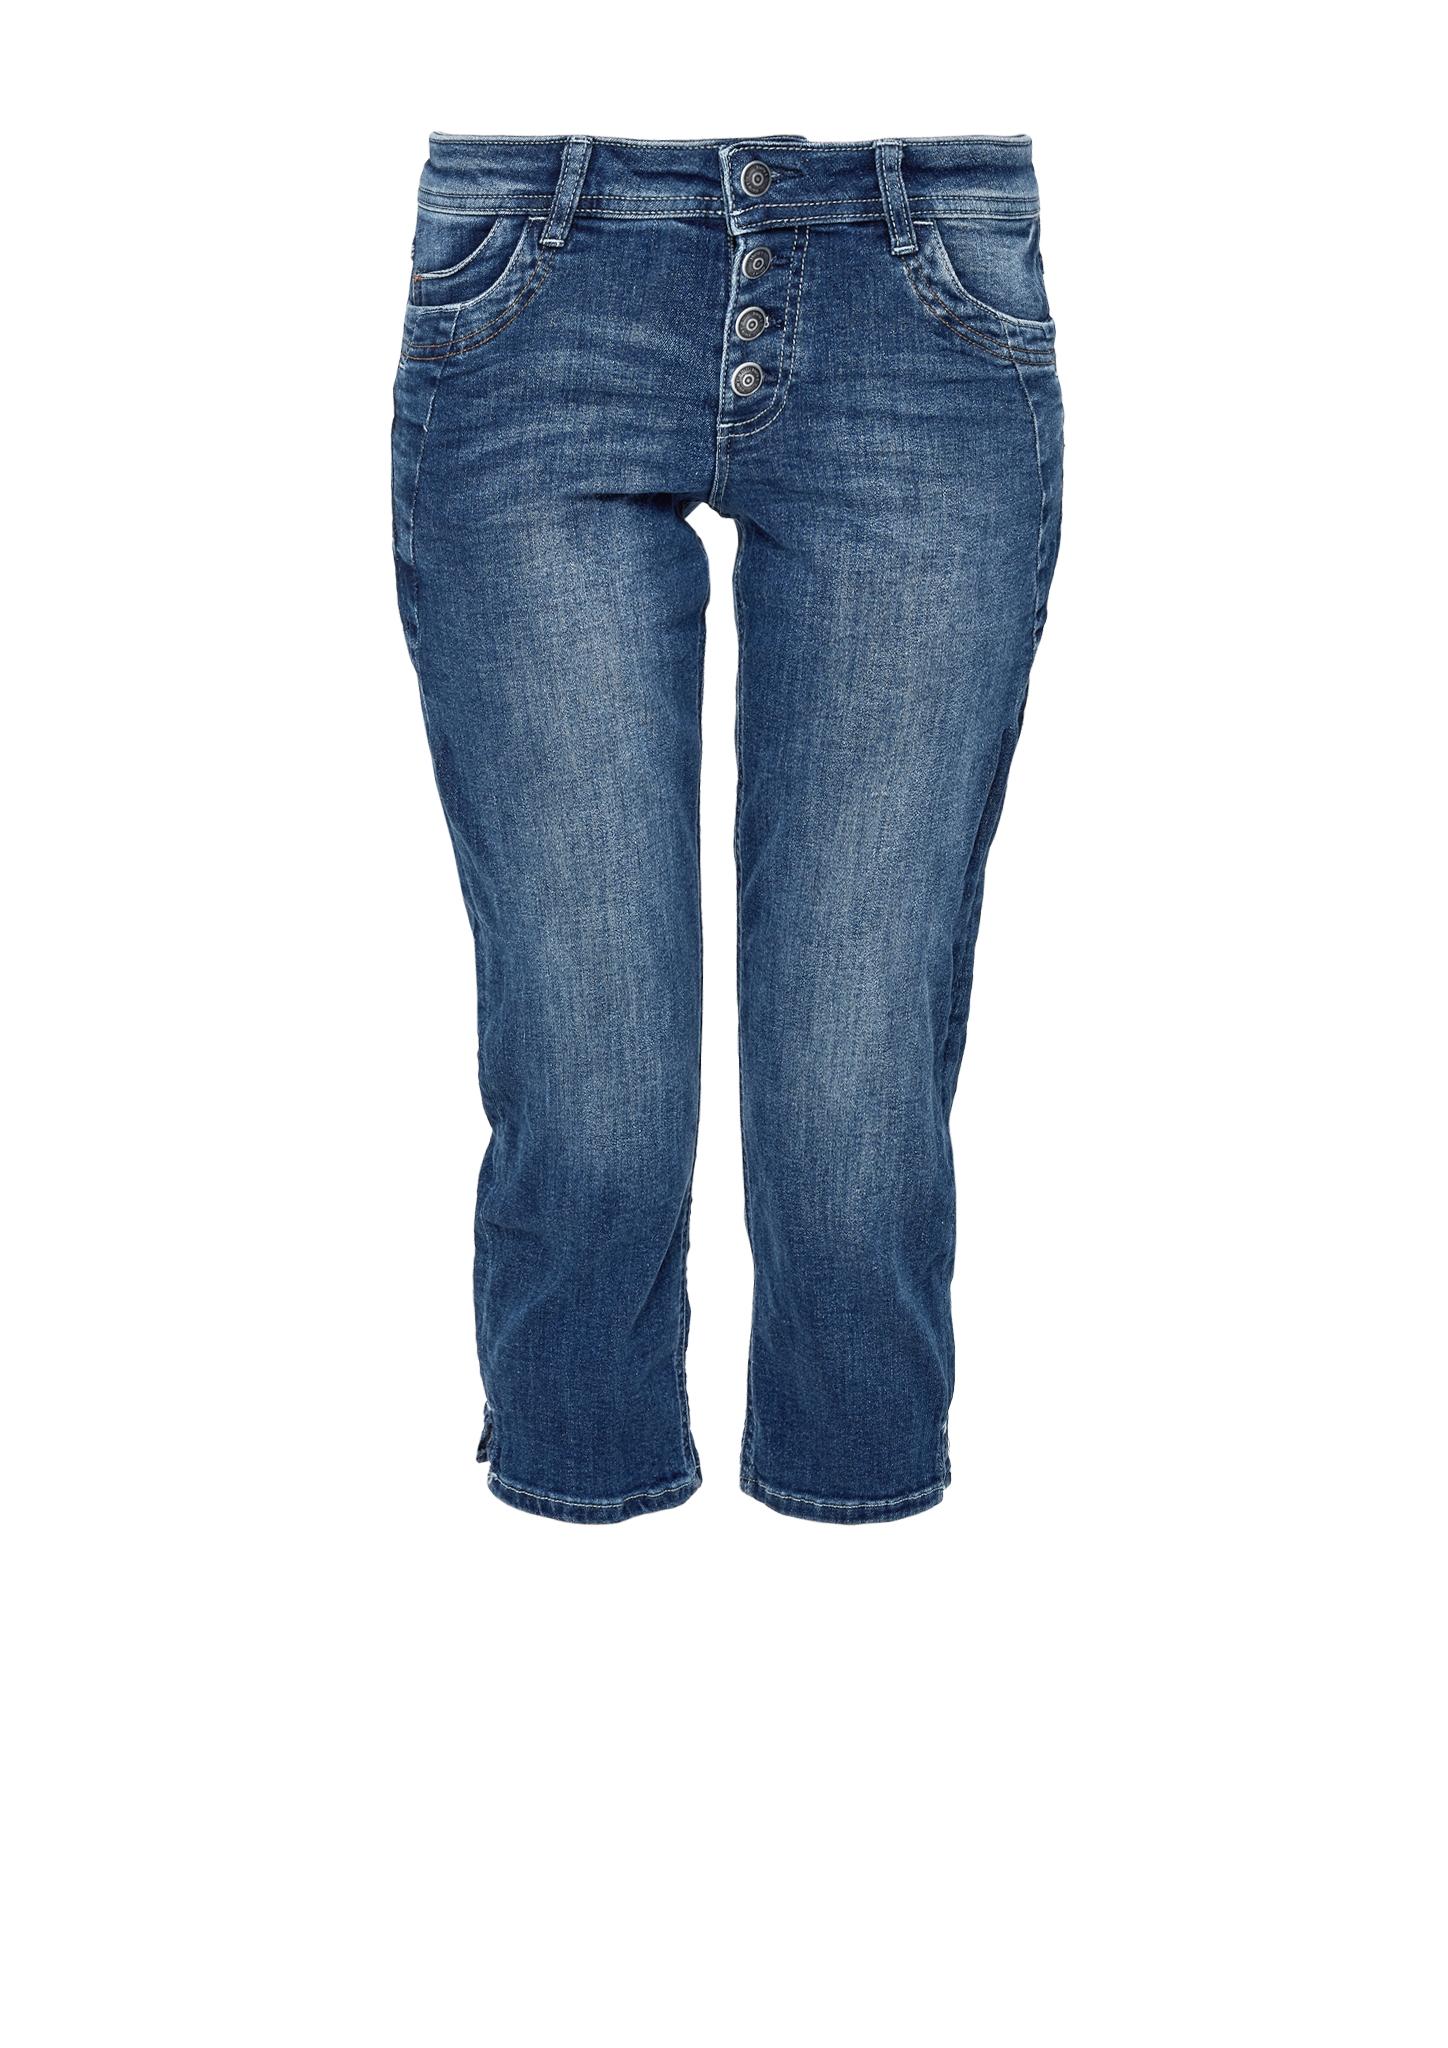 Capri-Jeans | Bekleidung > Jeans > Caprijeans | Blau | Obermaterial 72% baumwolle -  17% polyester -  9% modal -  2% elasthan| futter 50% baumwolle -  50% polyester | s.Oliver